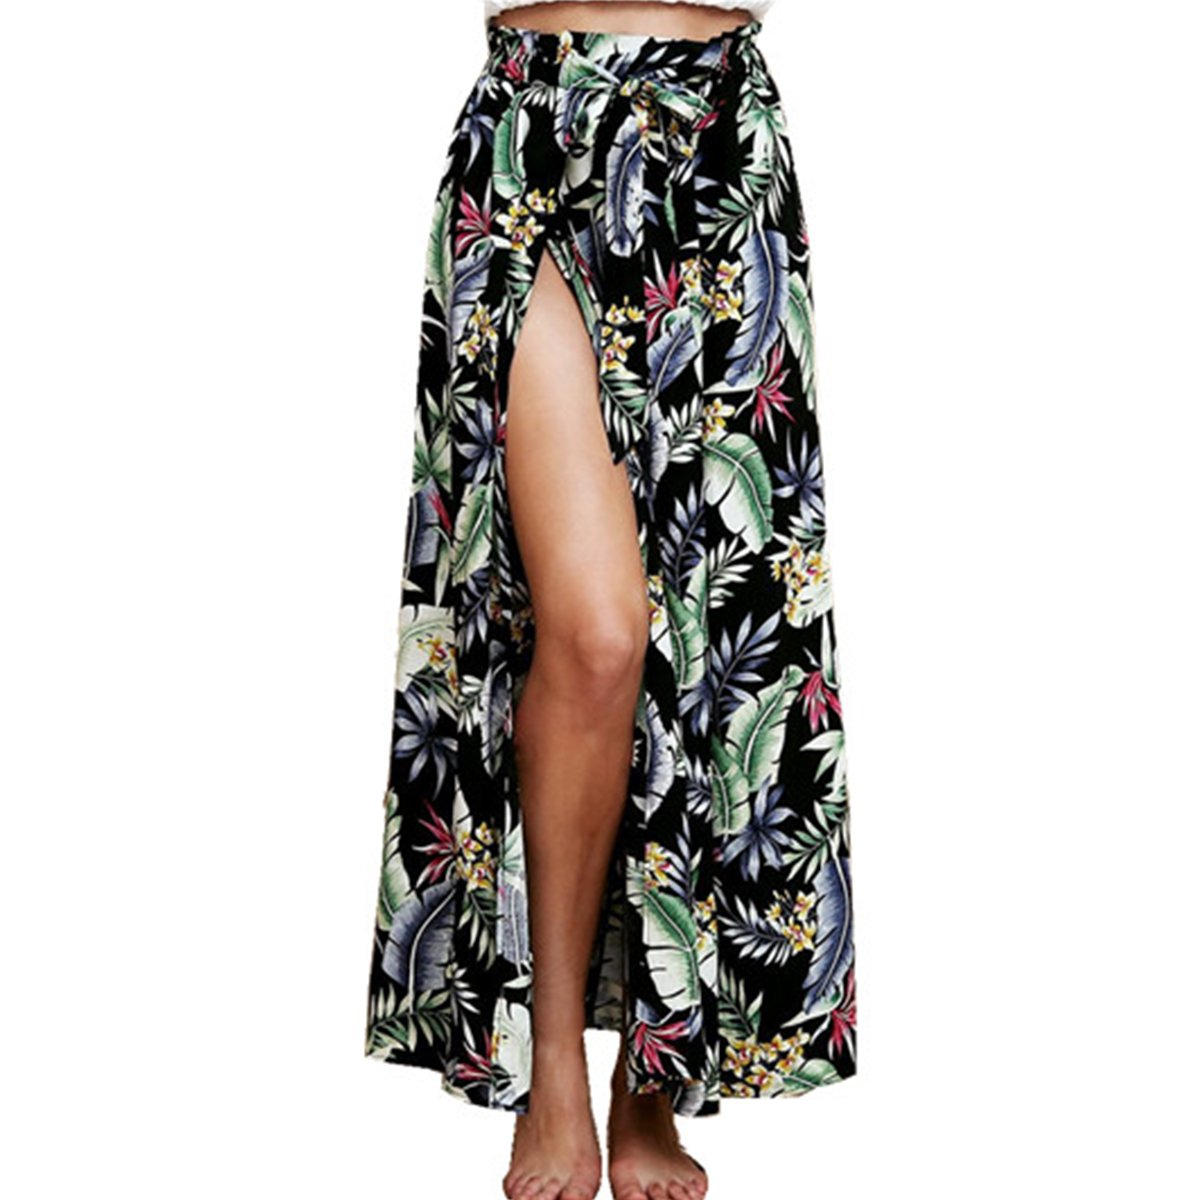 596154688c5 Plusnuolee Women's Bohemian Floral Print Tie up Long Maxi Skirt Split Beach  Wrap Skirt